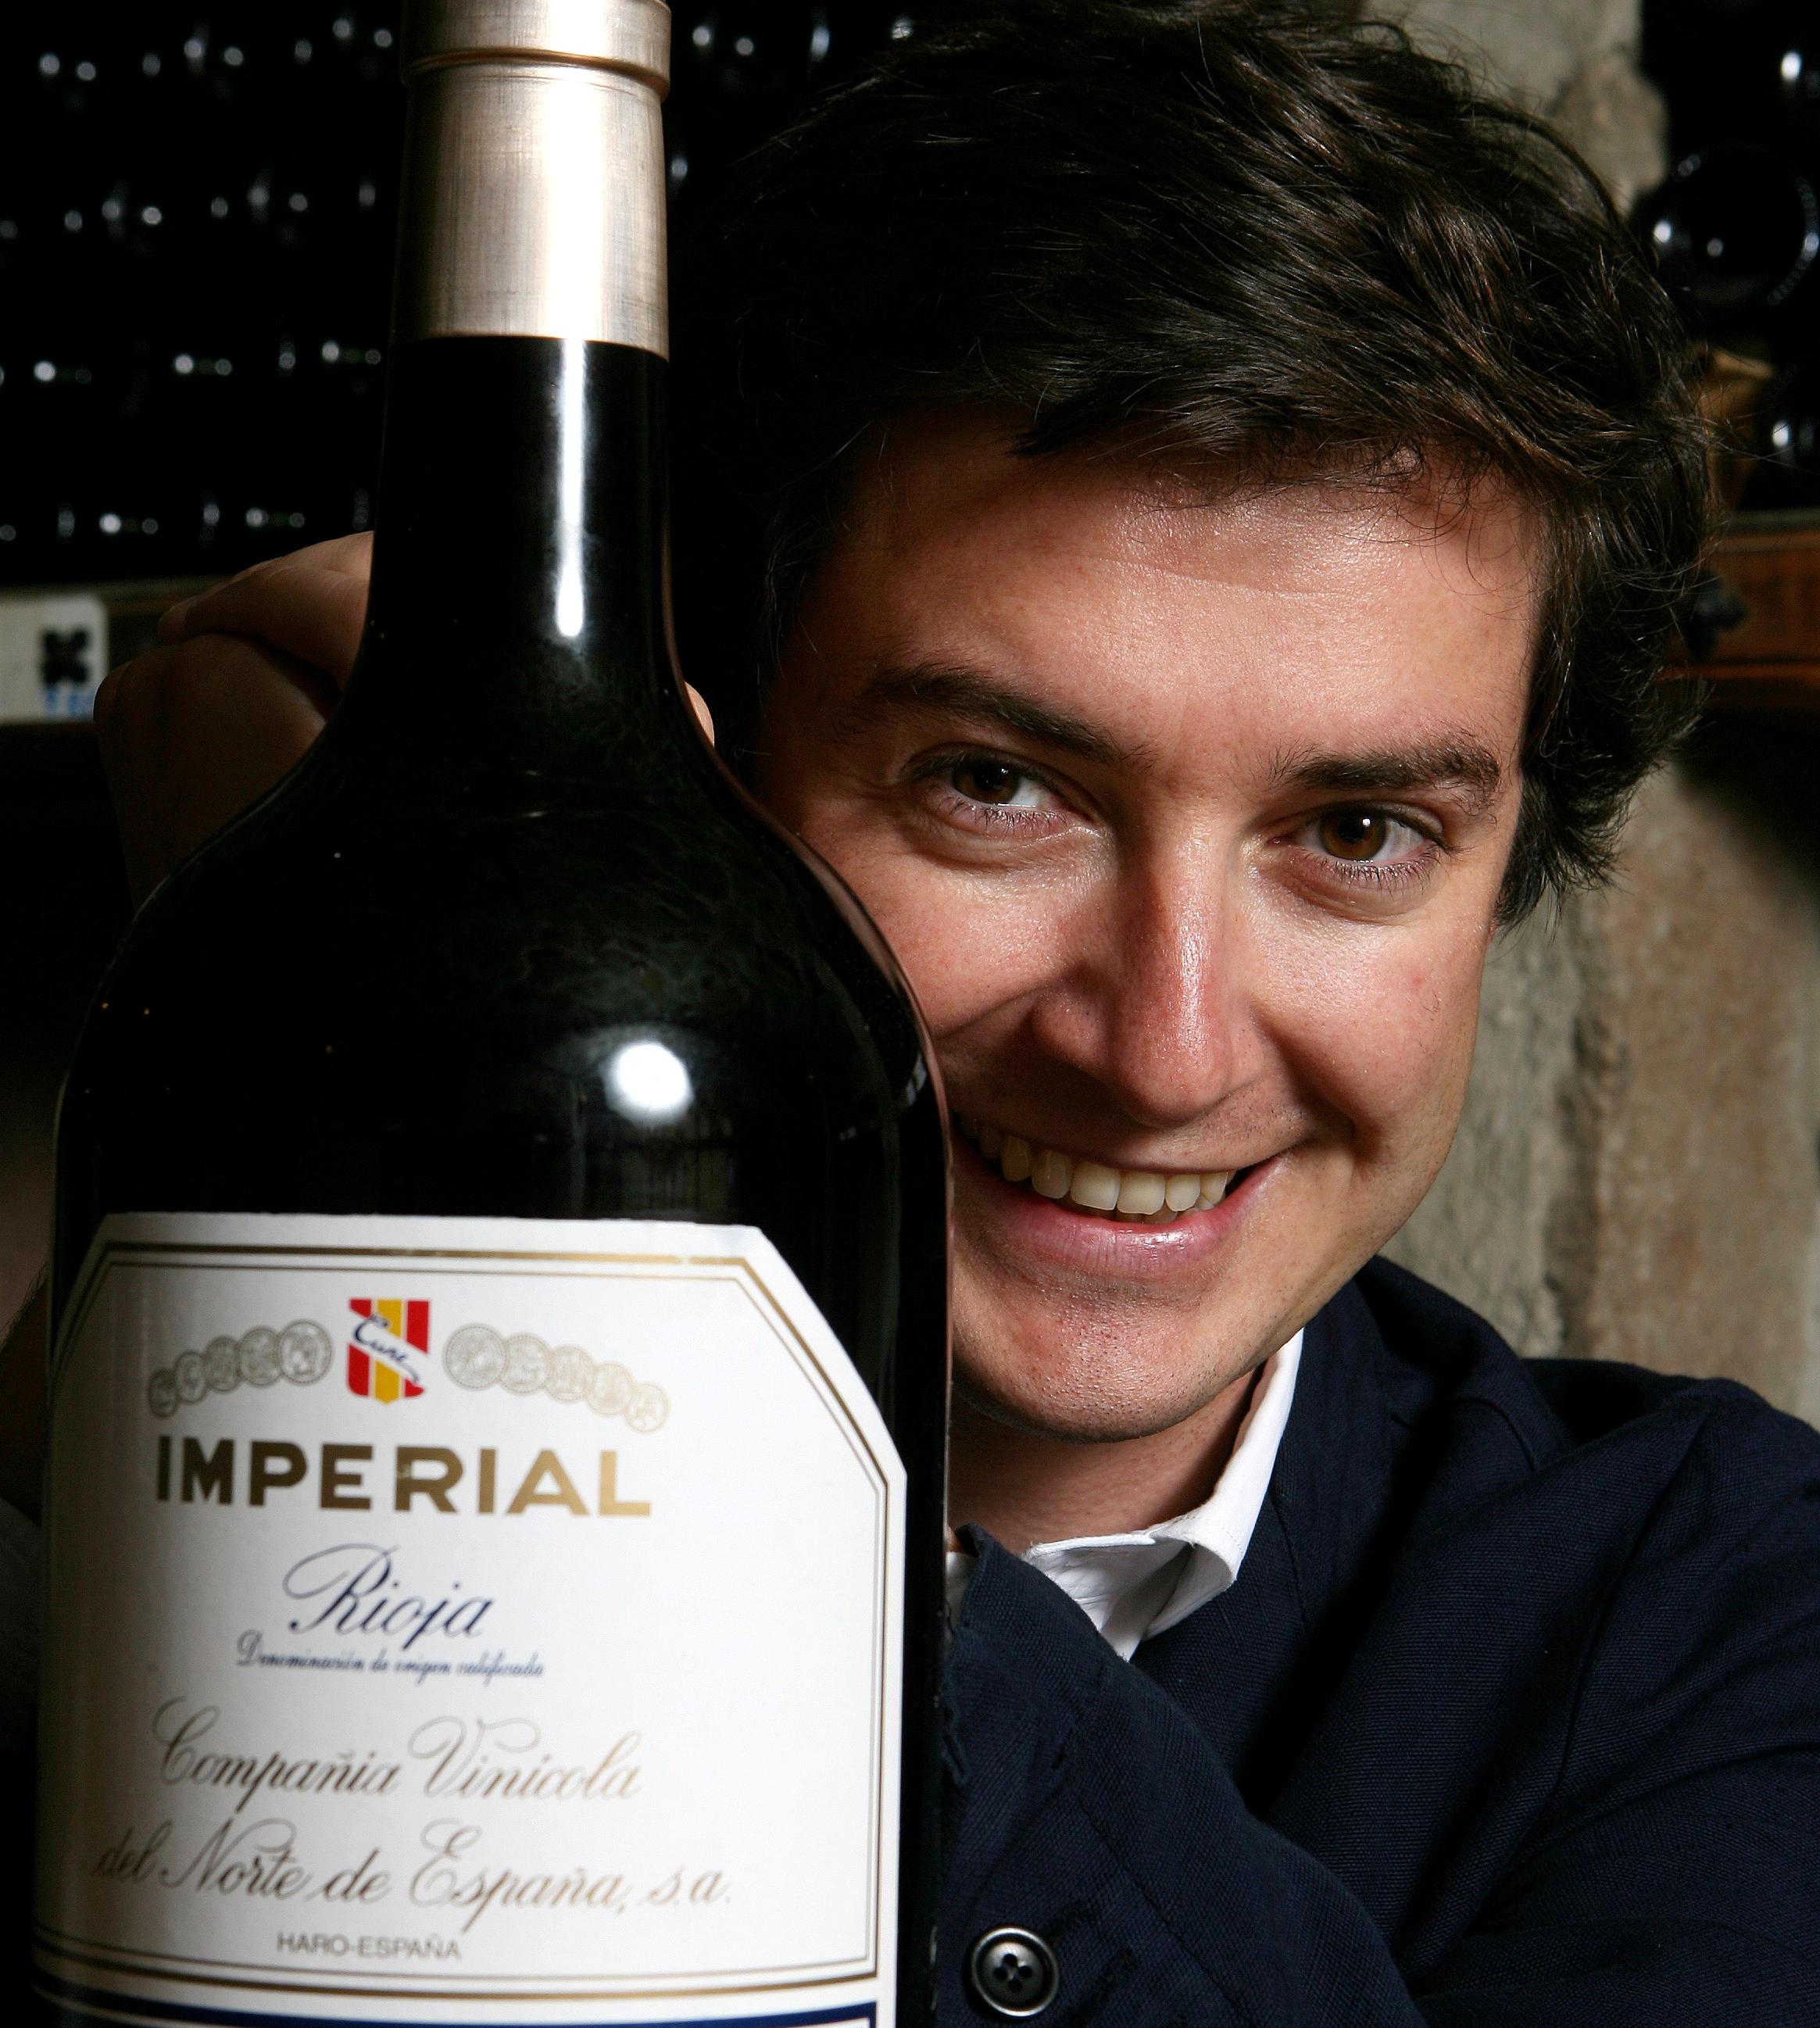 Cune Crianza er en god billigvin fra Rioja